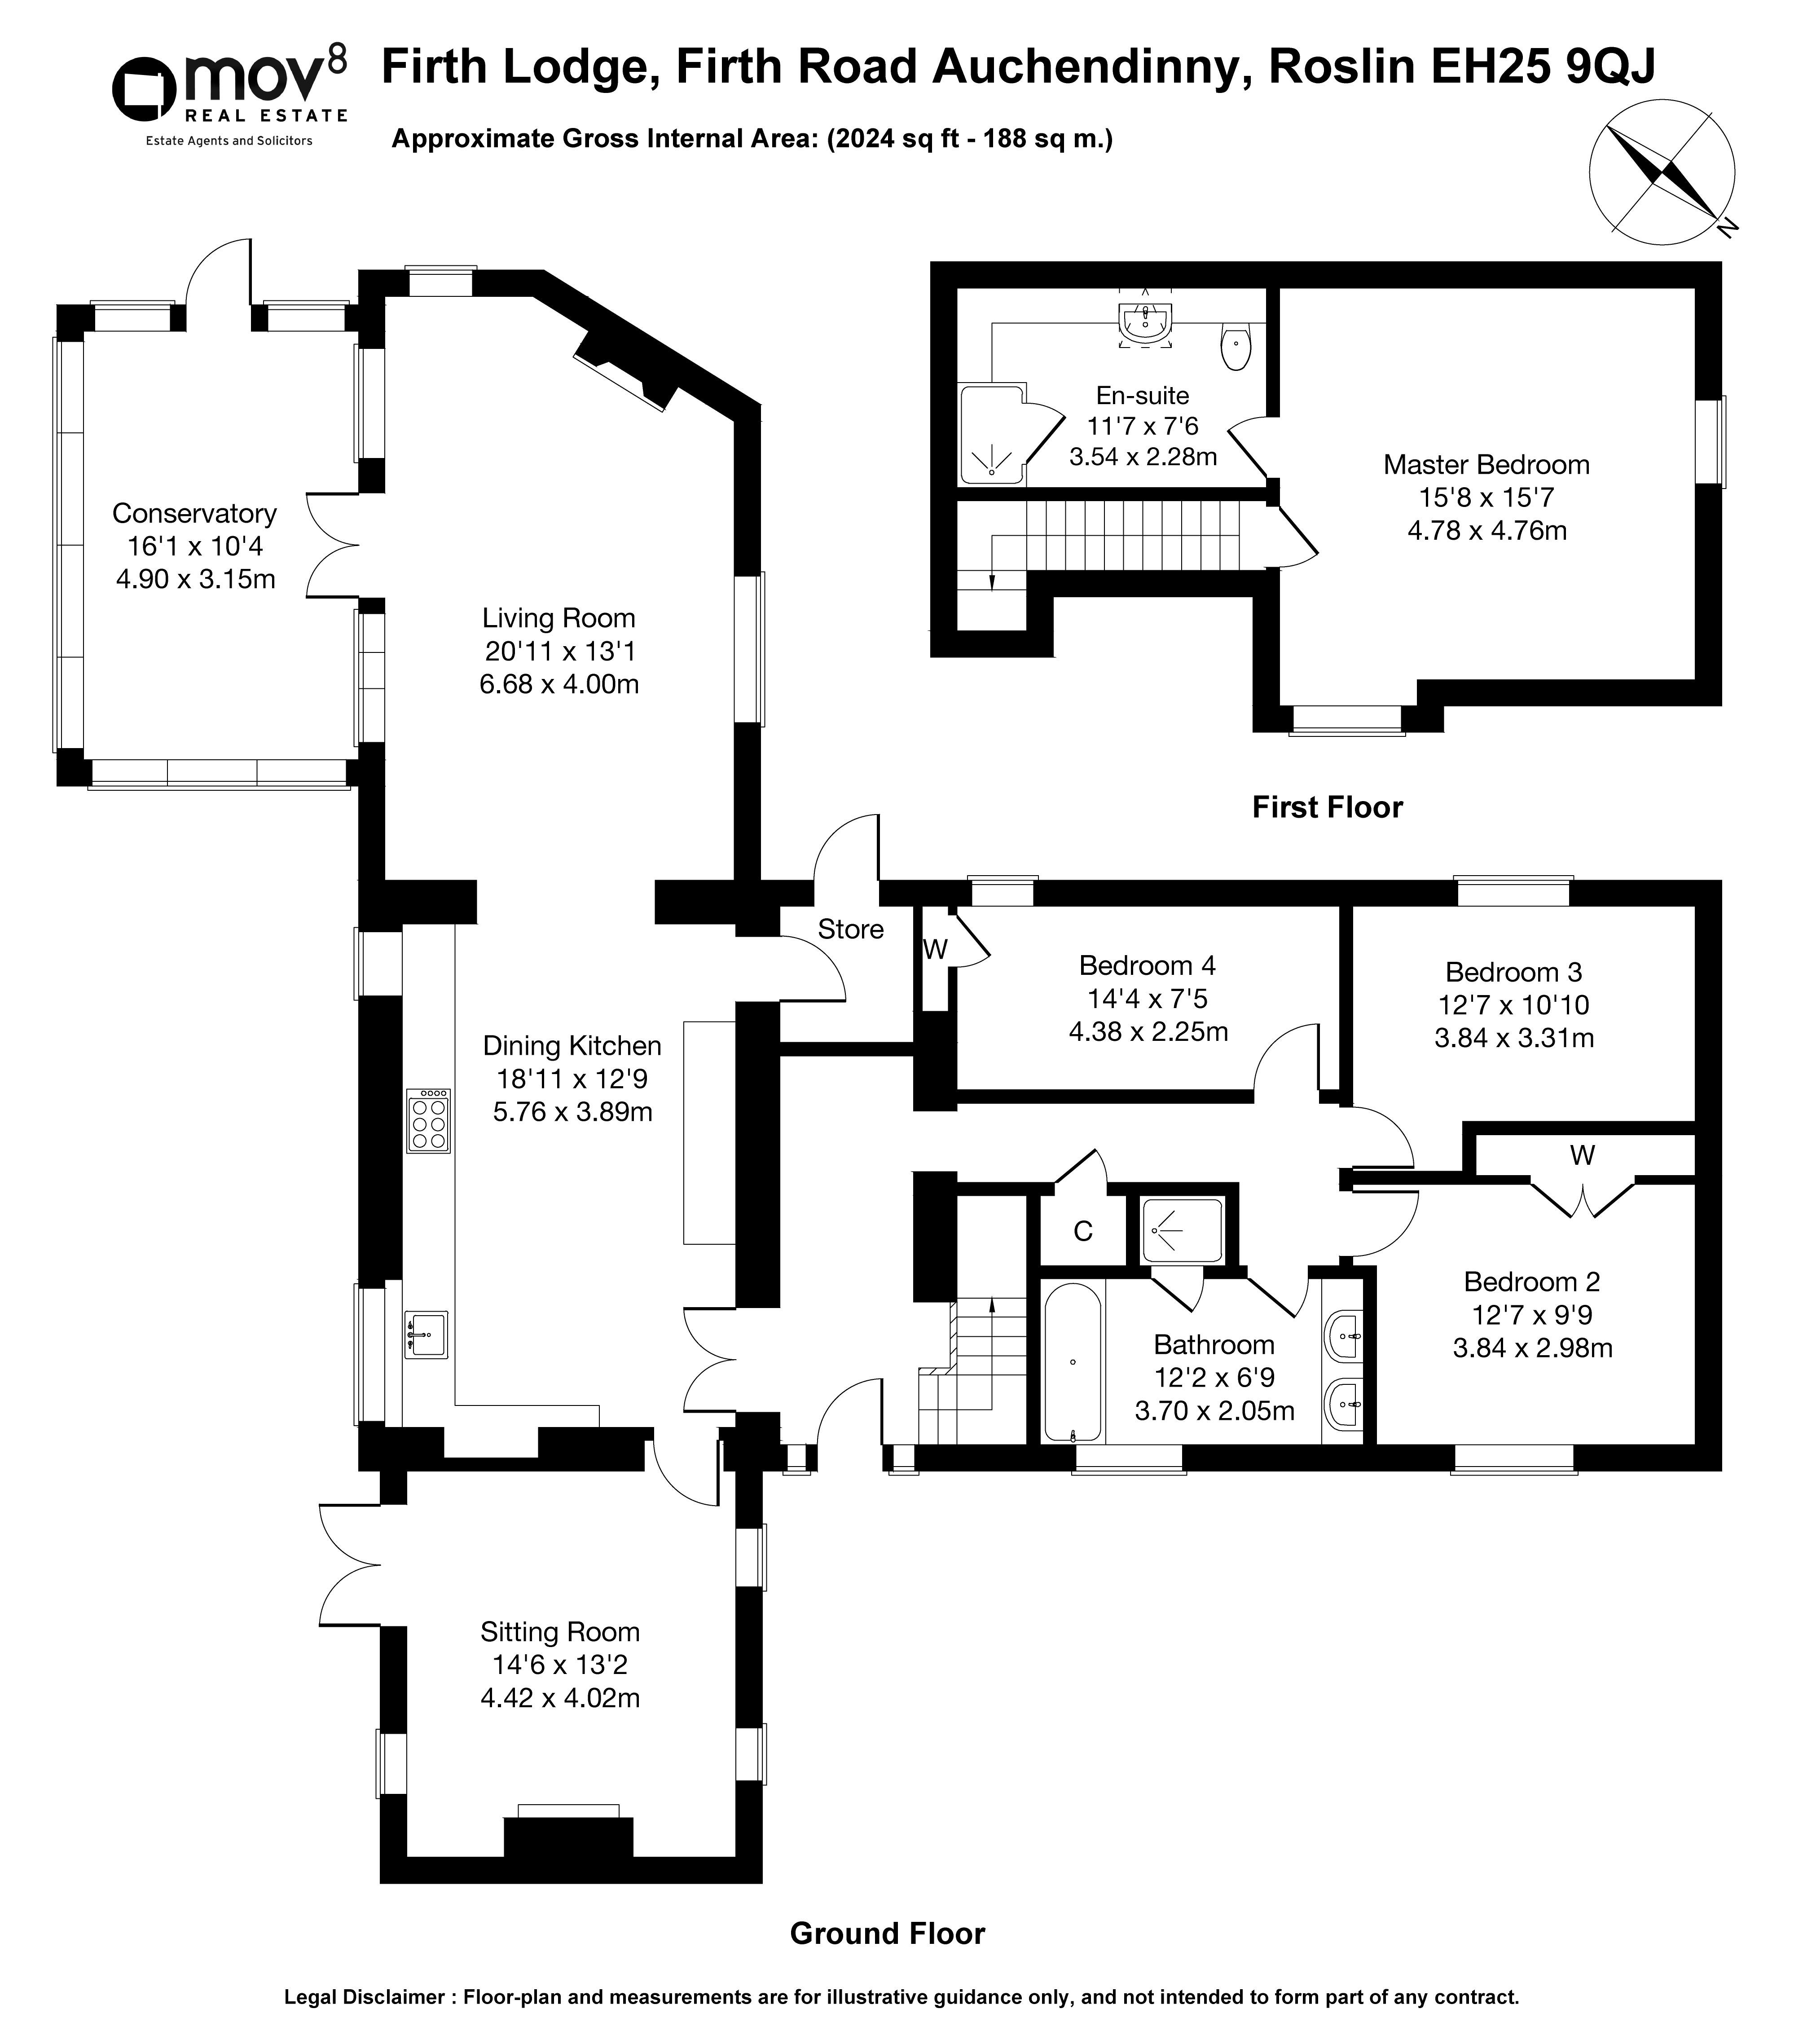 Floorplan 1 of Firth Lodge Firth Road, Auchendinny, Roslin, Midlothian, EH25 9QJ